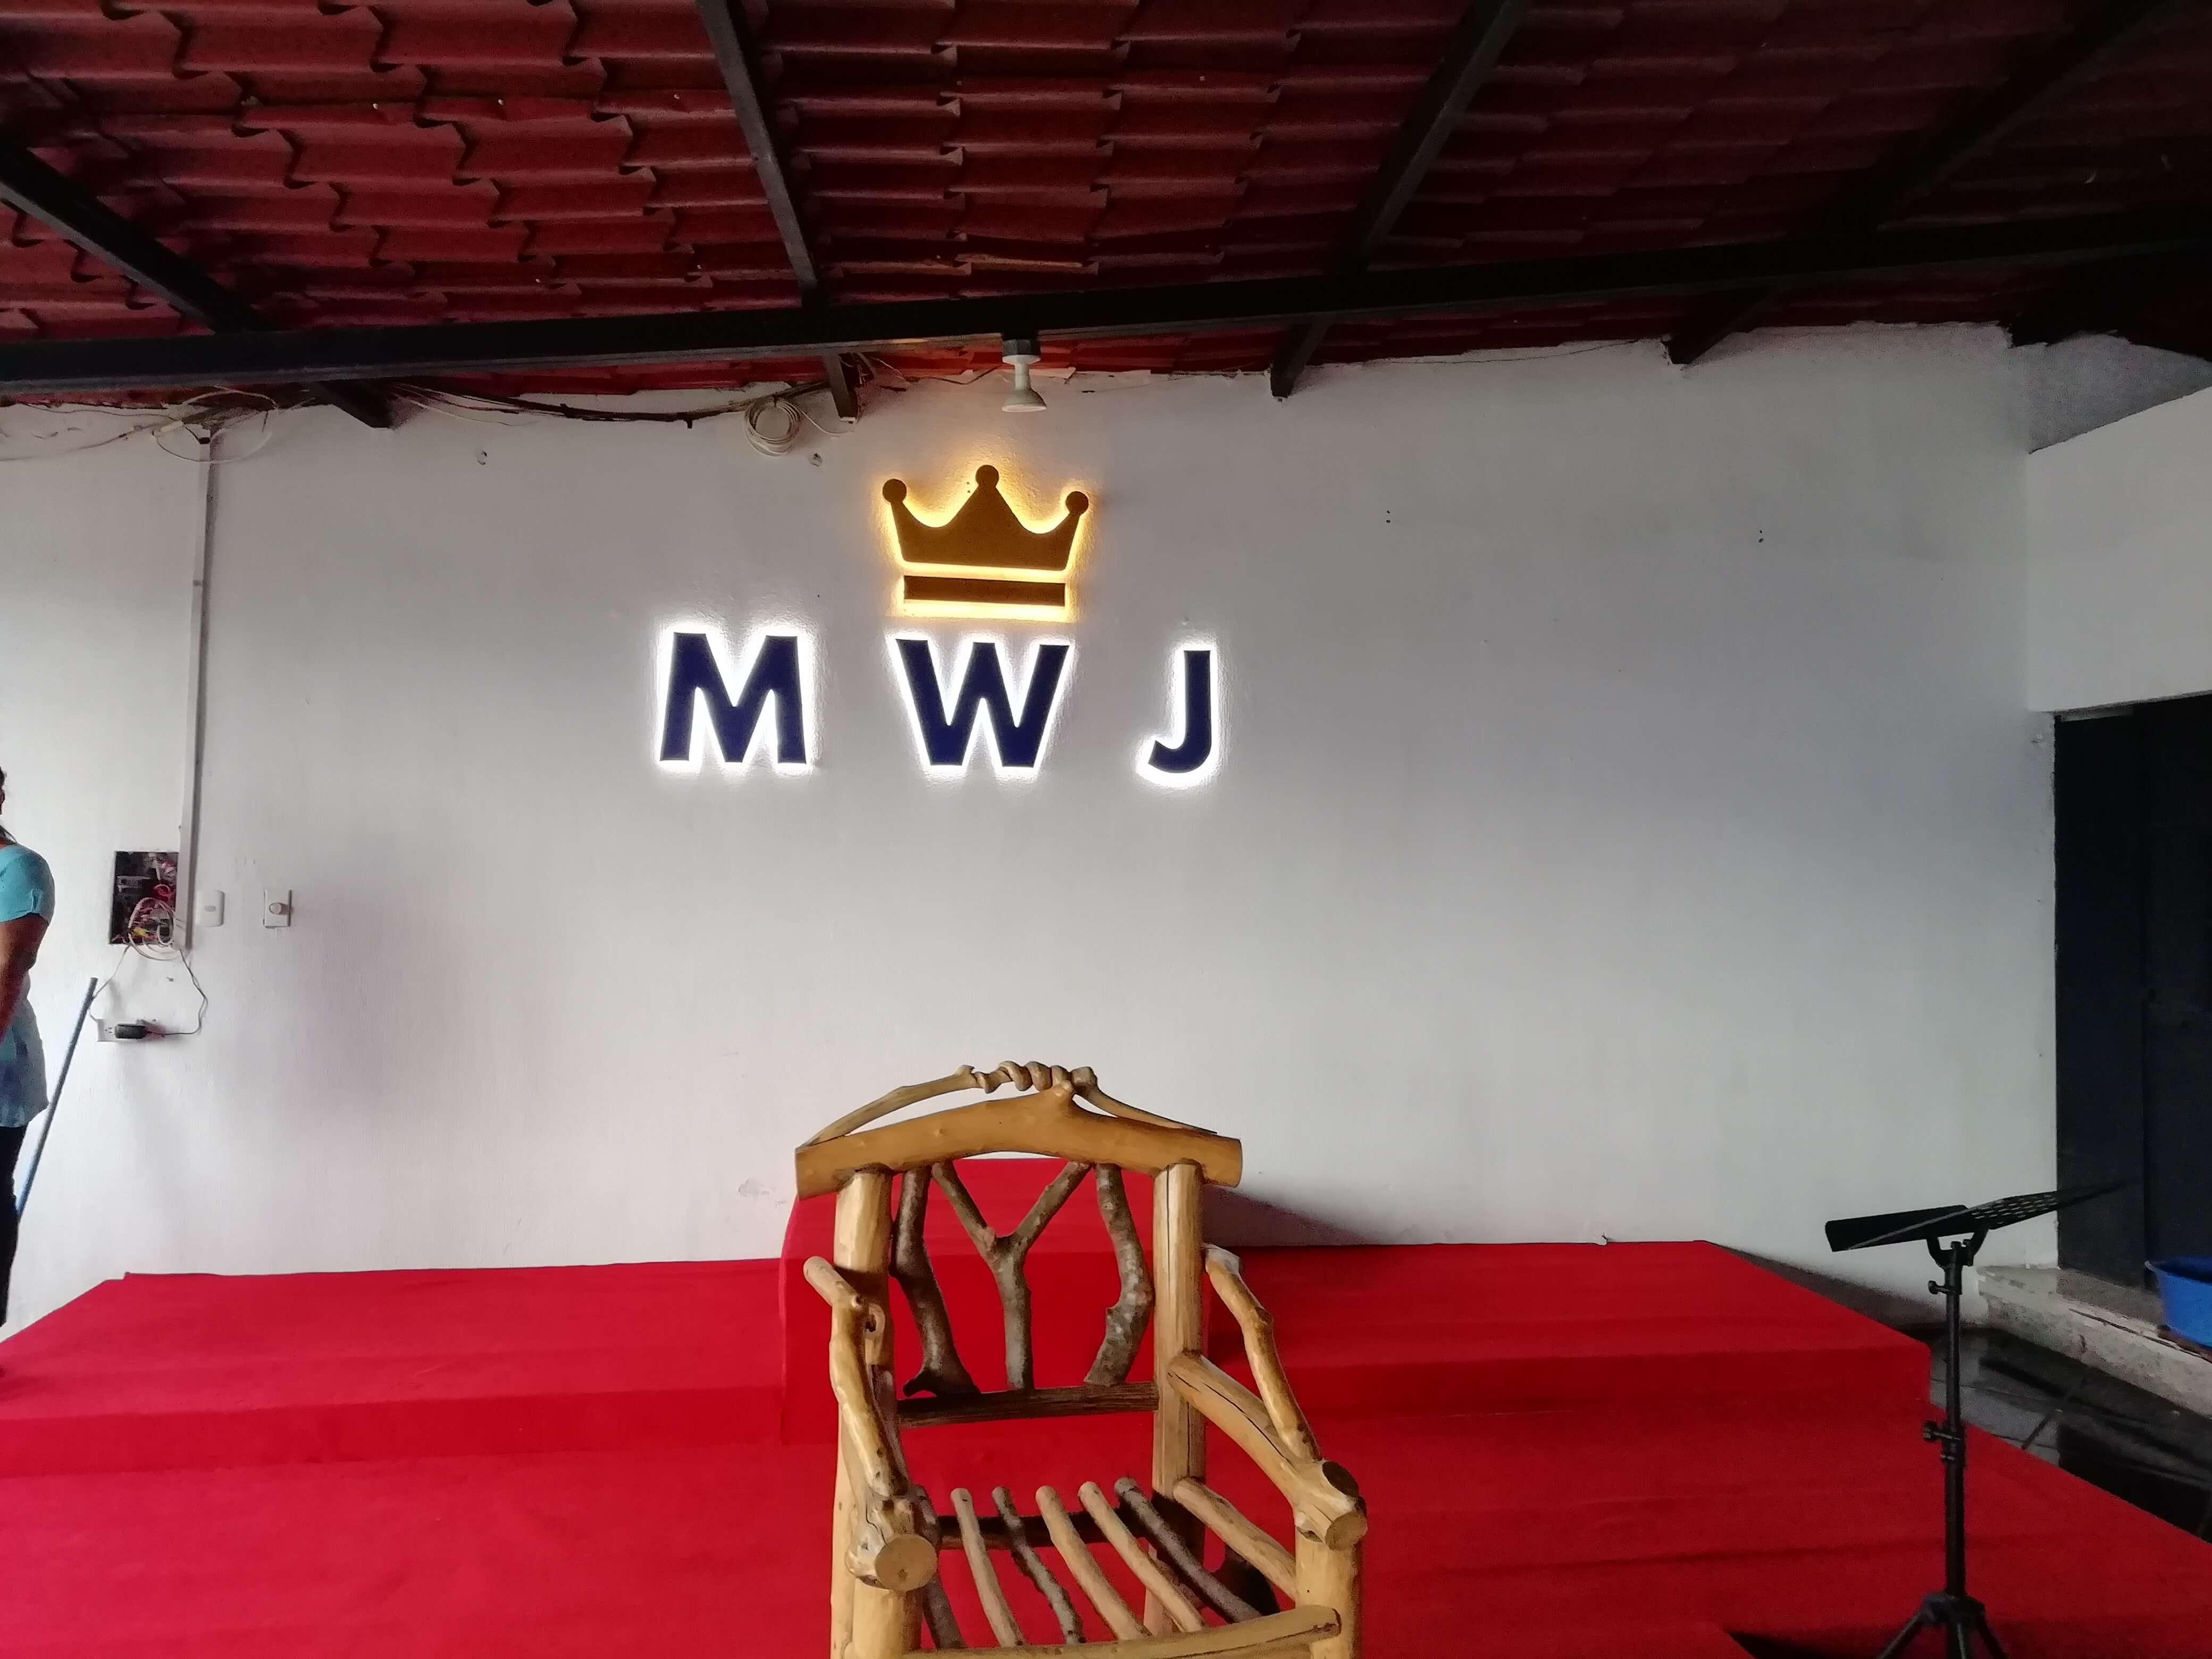 rotulo luminoso guatemala - MWJ